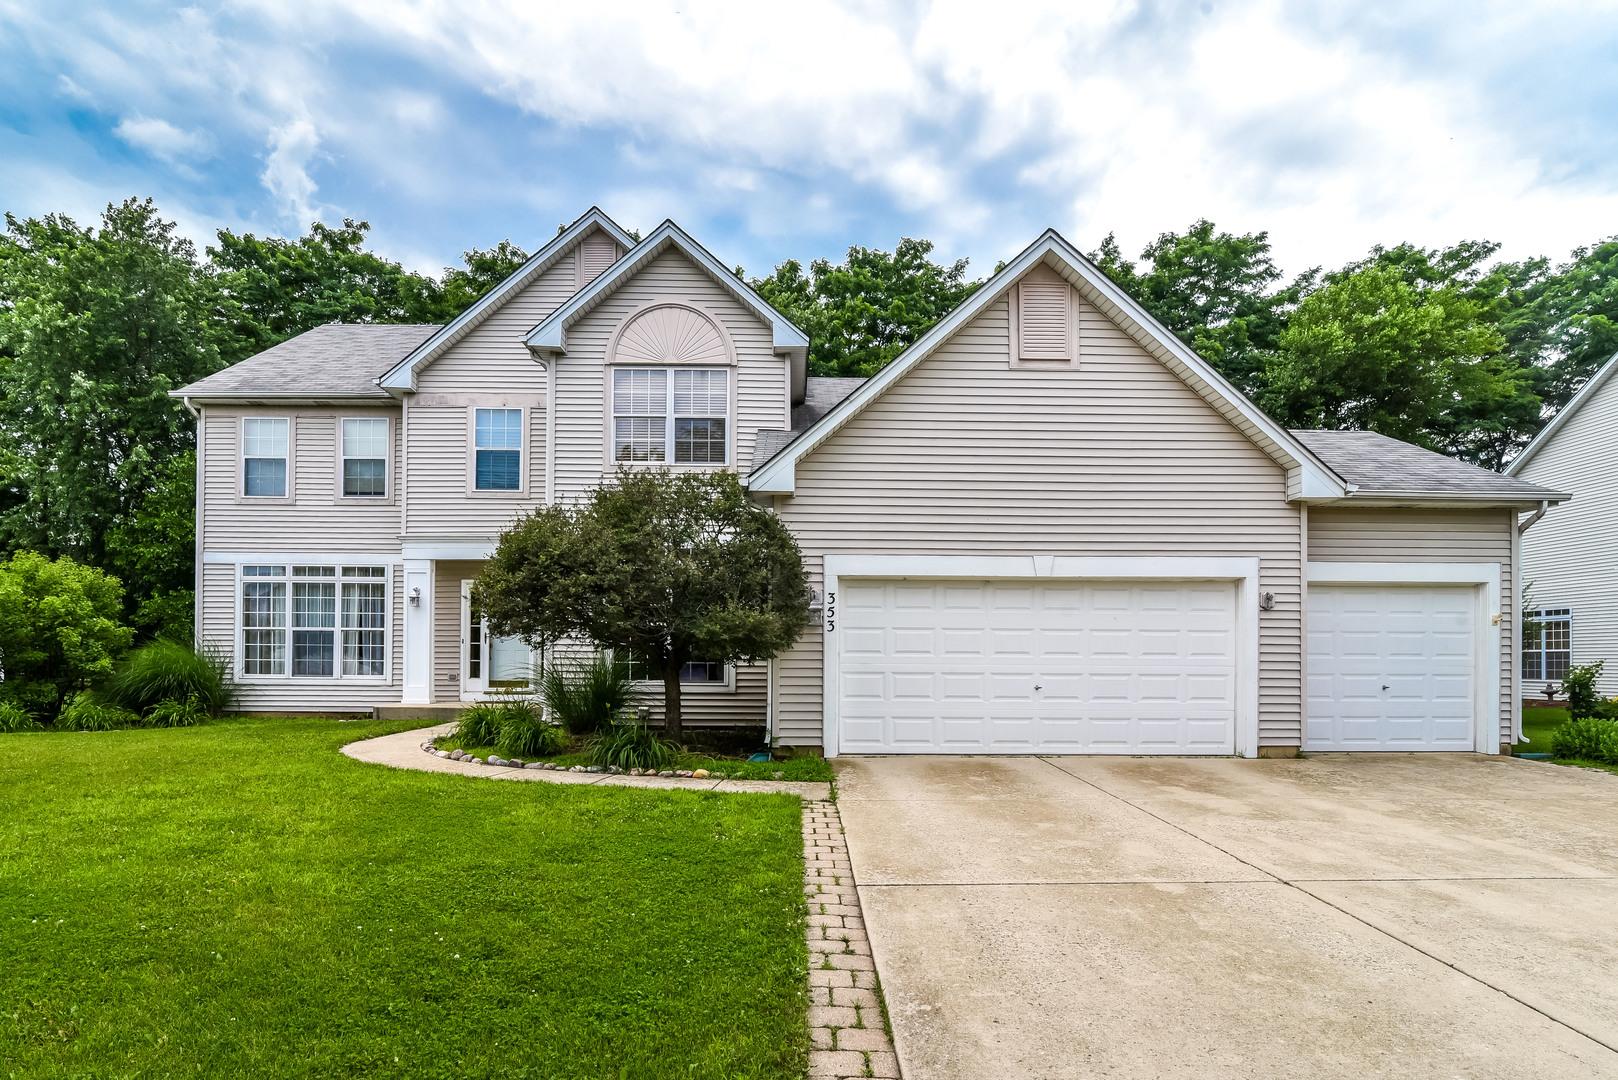 353 Whitewater ,Oswego, Illinois 60543